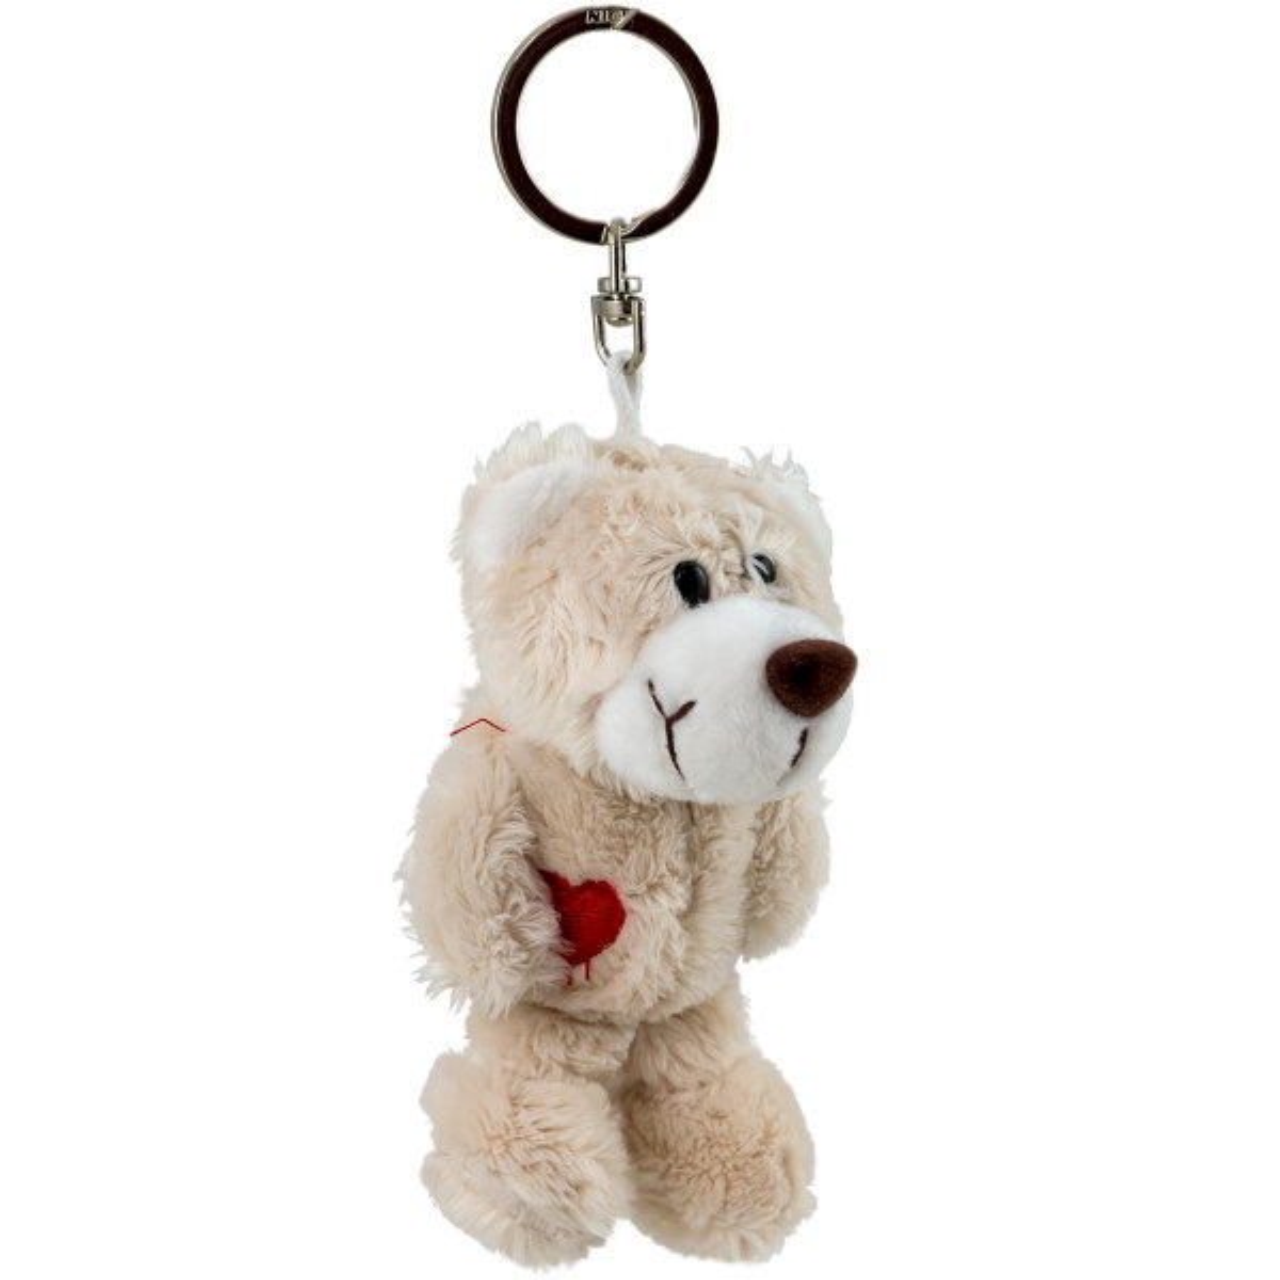 جاسوئیچی عروسکی نیکی مدل خرس و قلب